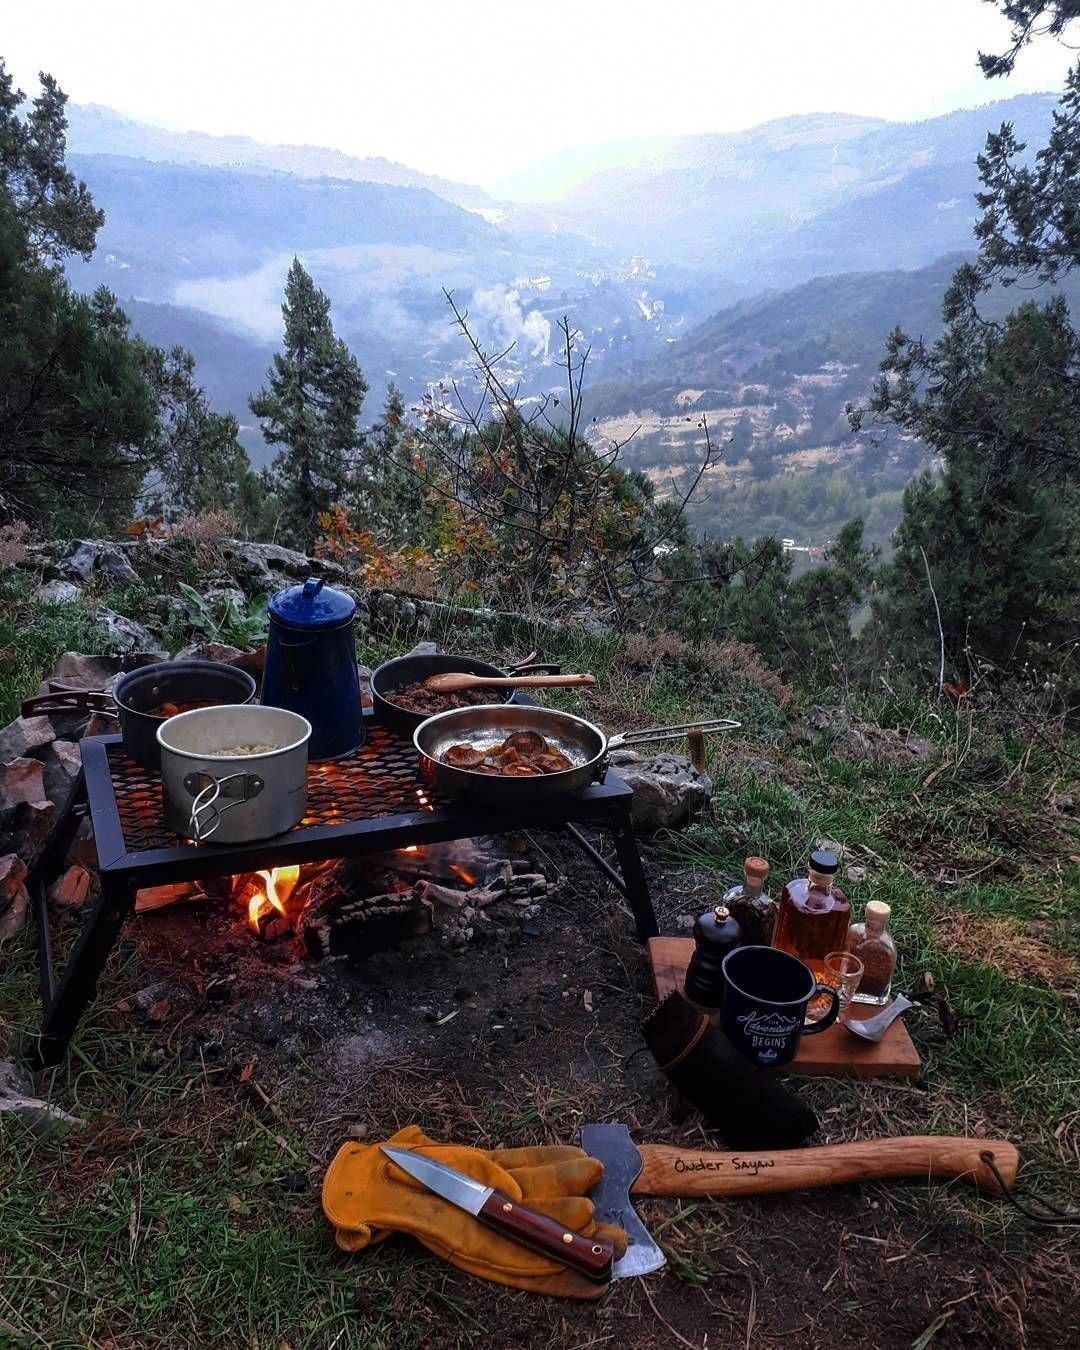 Photo of primitive camping checklist #Campingchecklist #camping #campingchecklist #checkl…